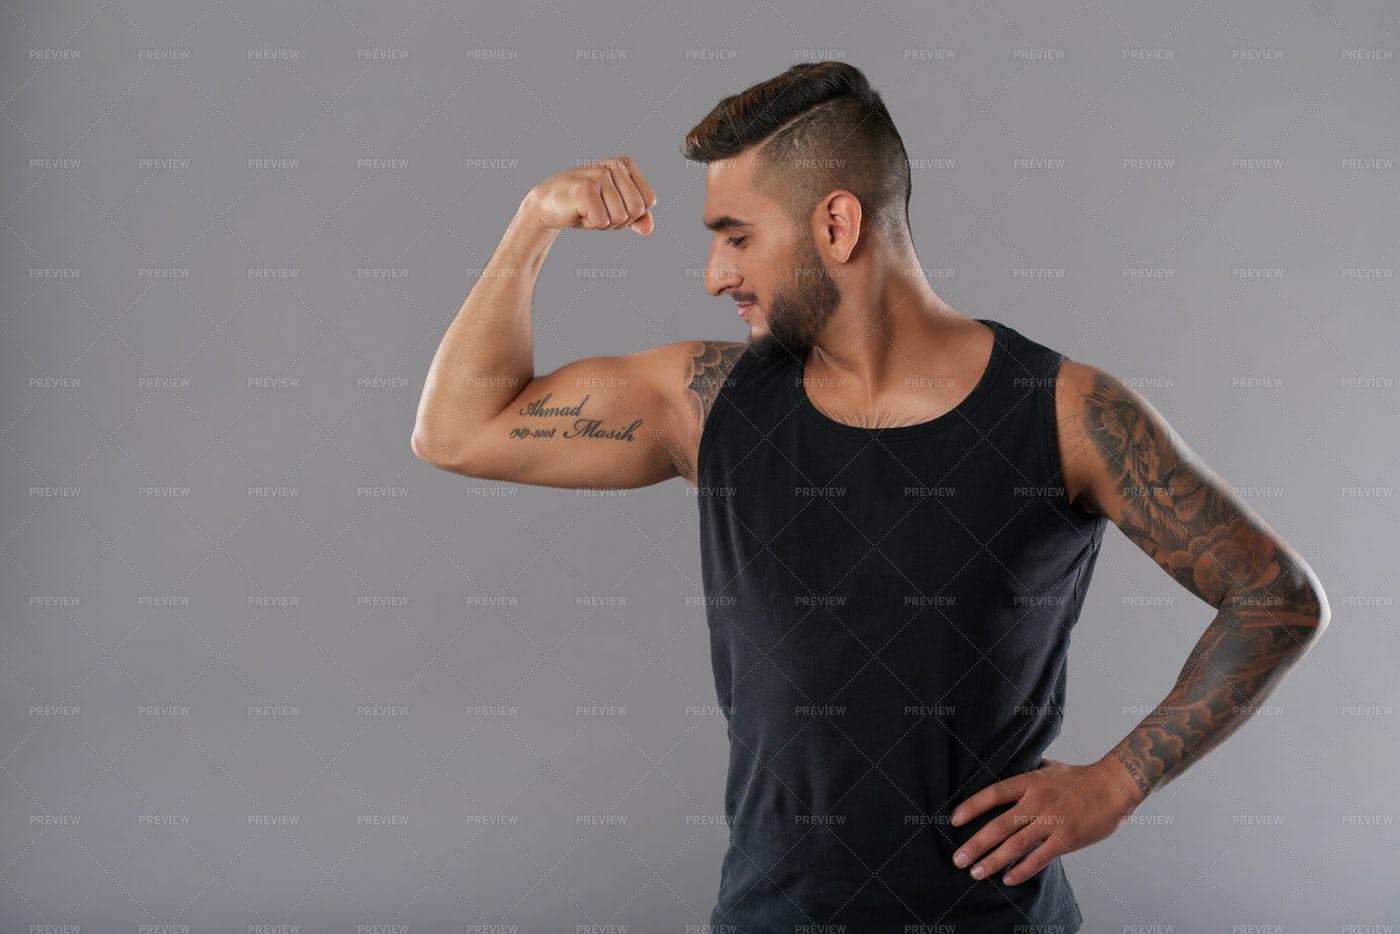 Confident Athlete Showing Bicep...: Stock Photos